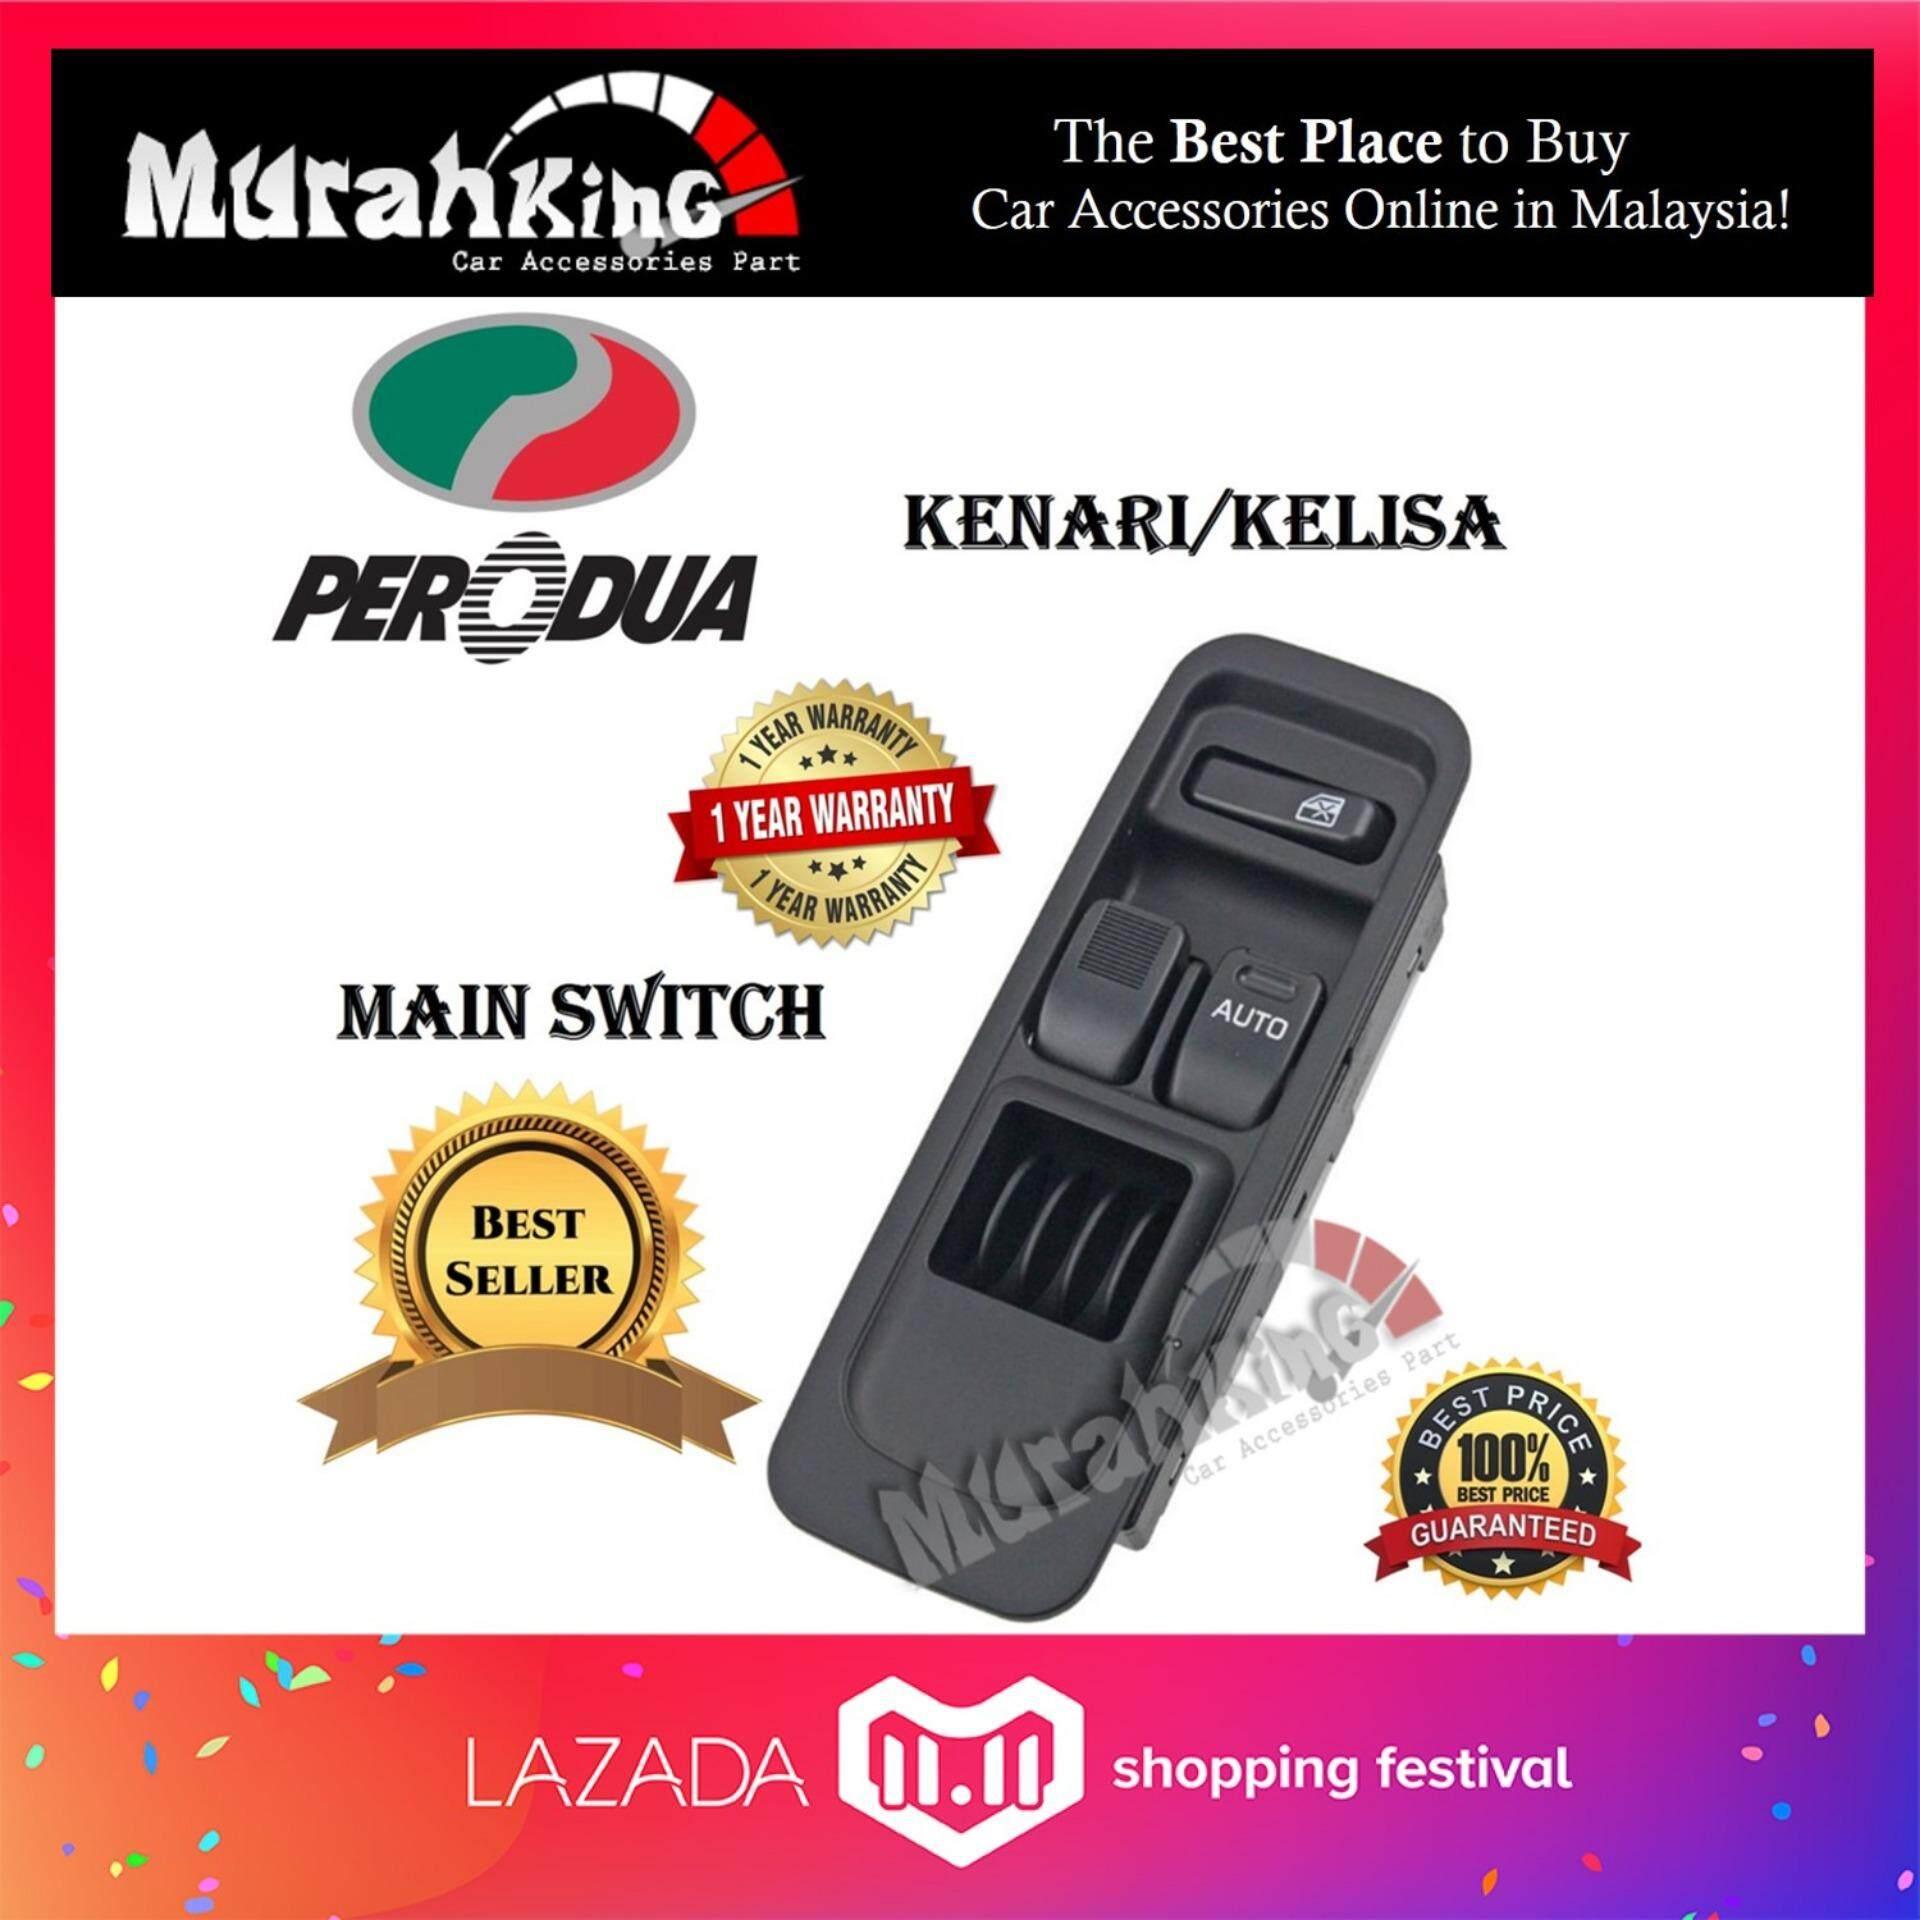 OEM Power Window Switch for Perodua Kenari / Kelisa (Main Switch) - 2 Button